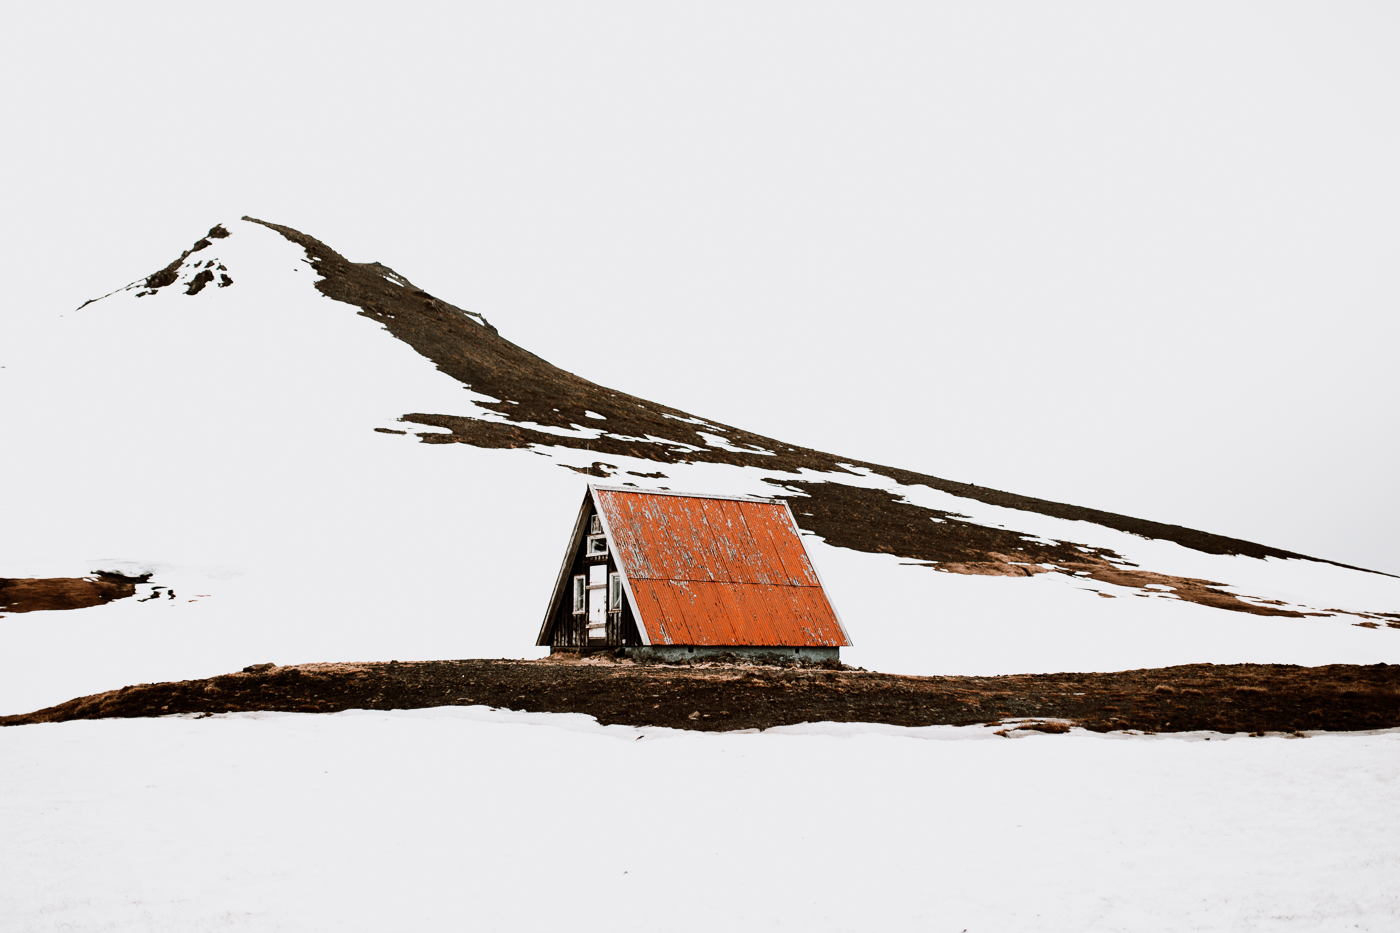 A-Frame Cabin, Snæfellsnes Peninsula